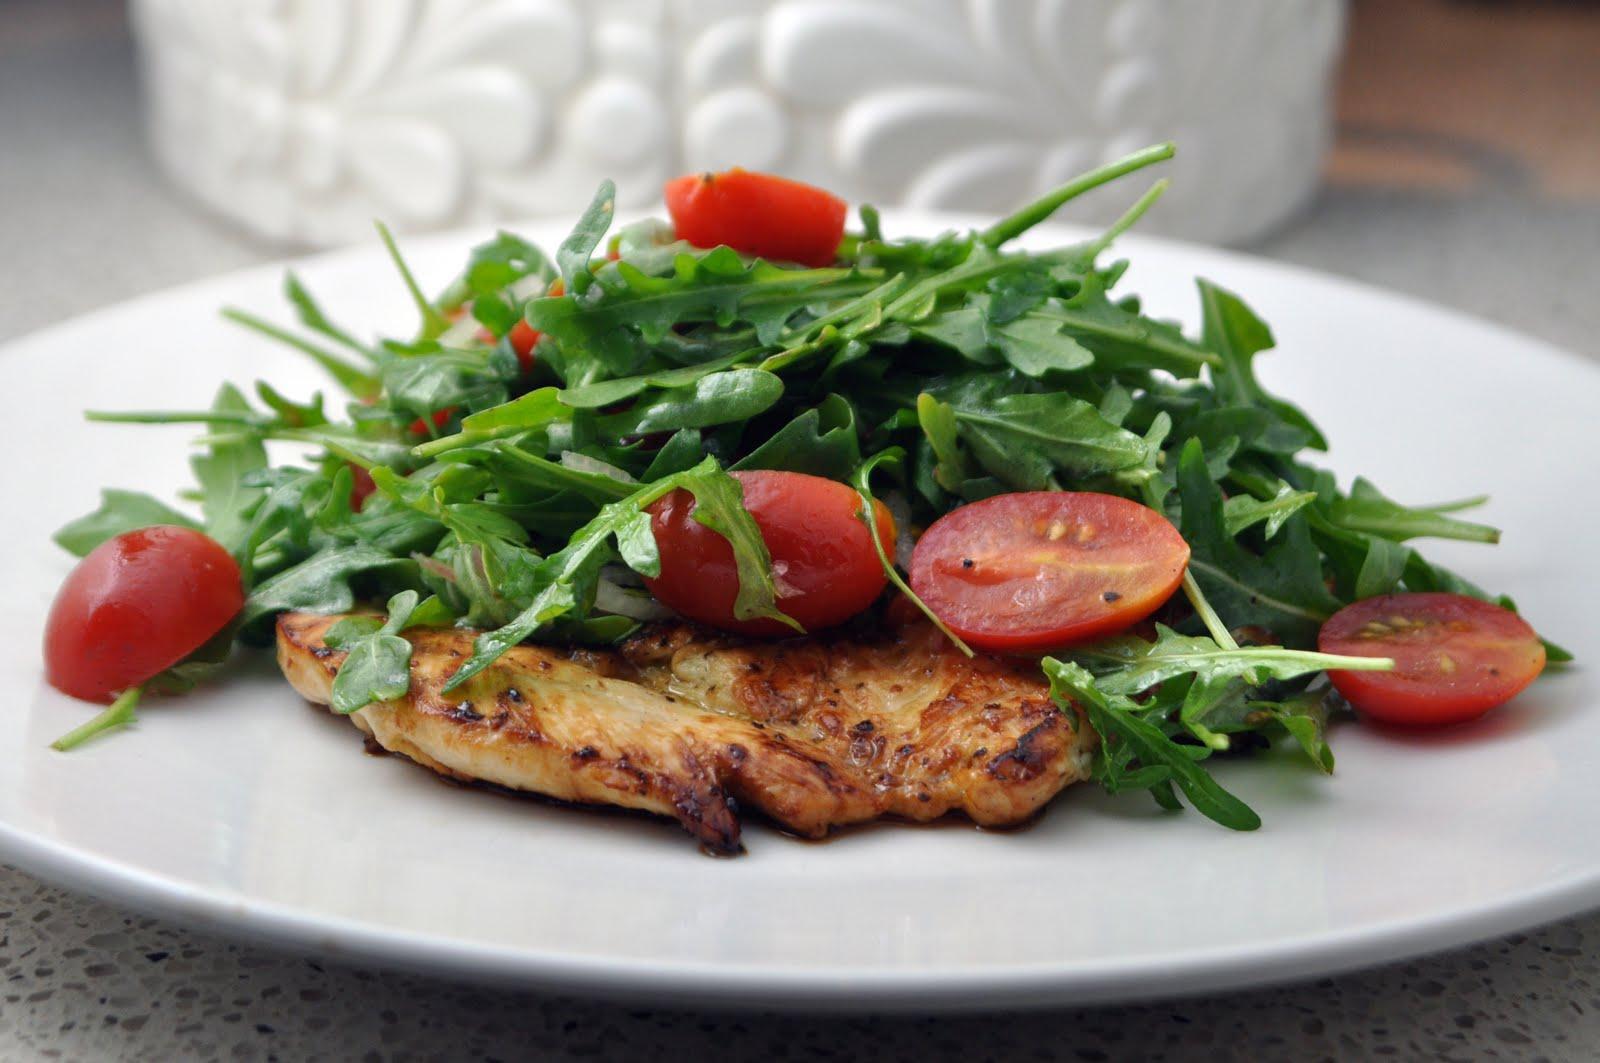 Photo from : Impeccable Taste -Chicken Paillard